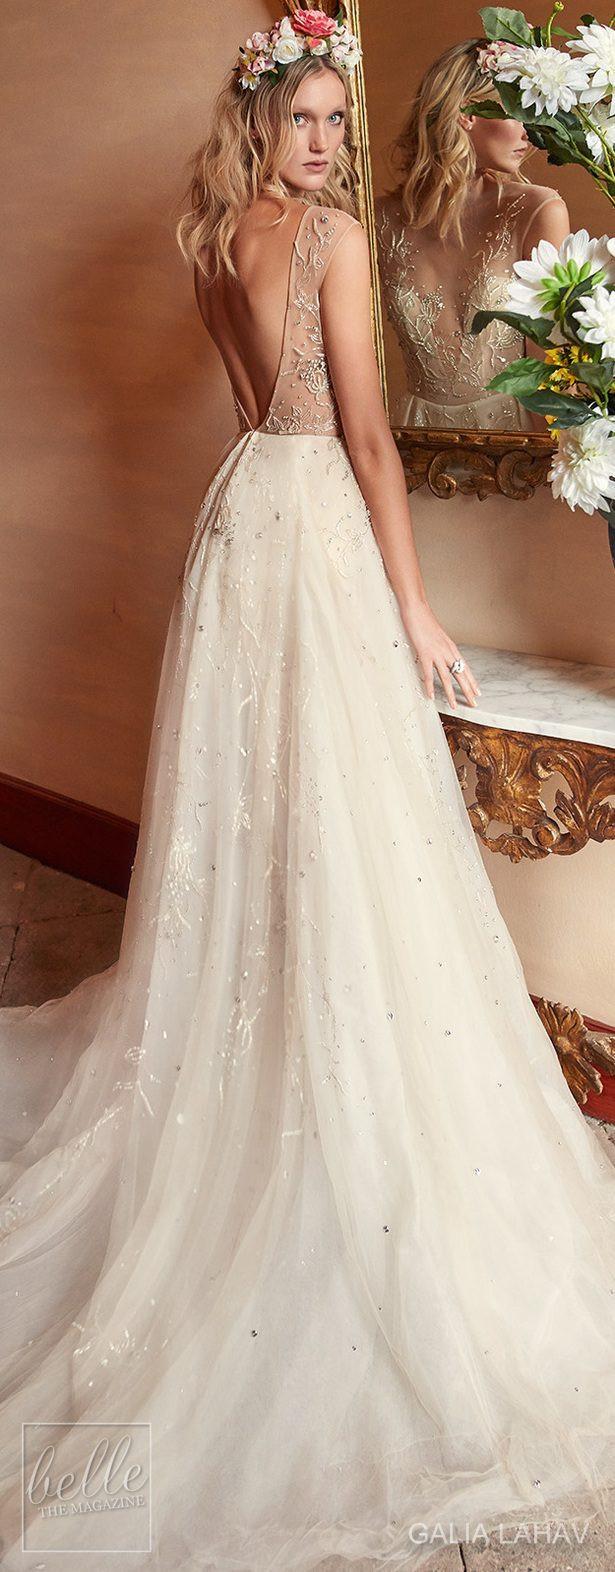 Wedding Night Gowns  Wedding Dresses by Galia Lahav Couture Bridal Fall 2018